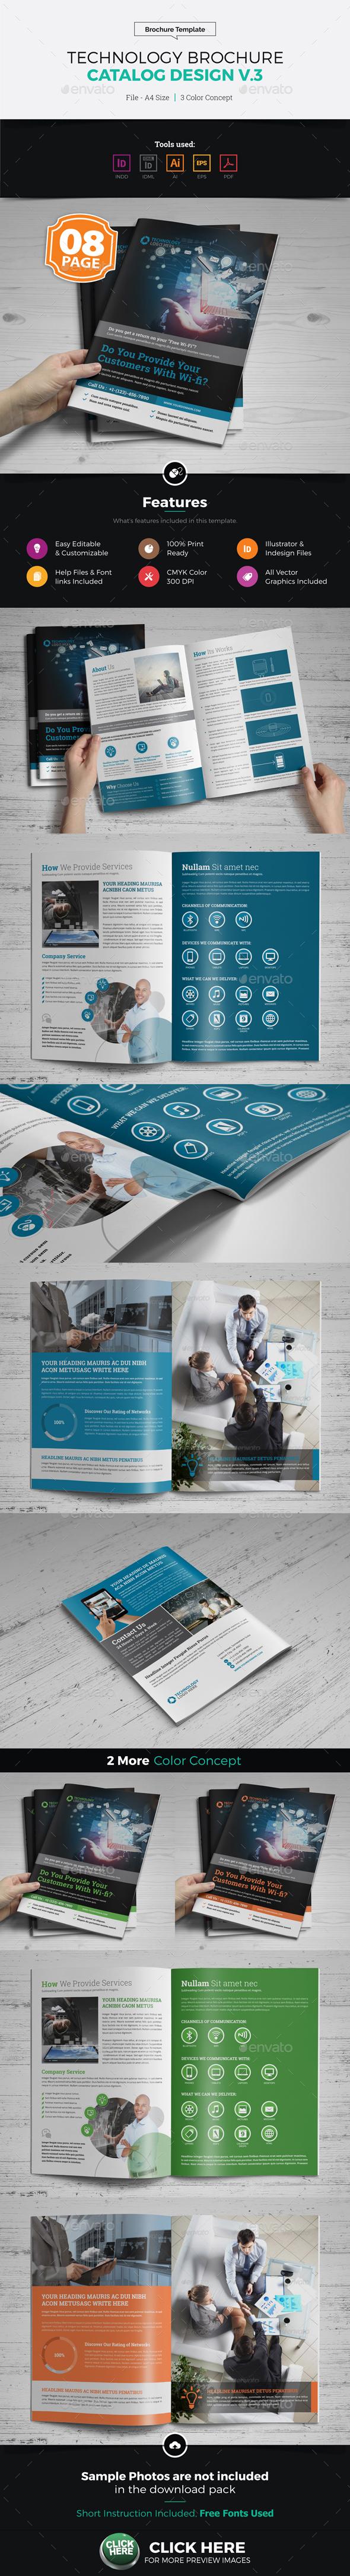 Technology Brochure Catalog Template v3 - Corporate Brochures